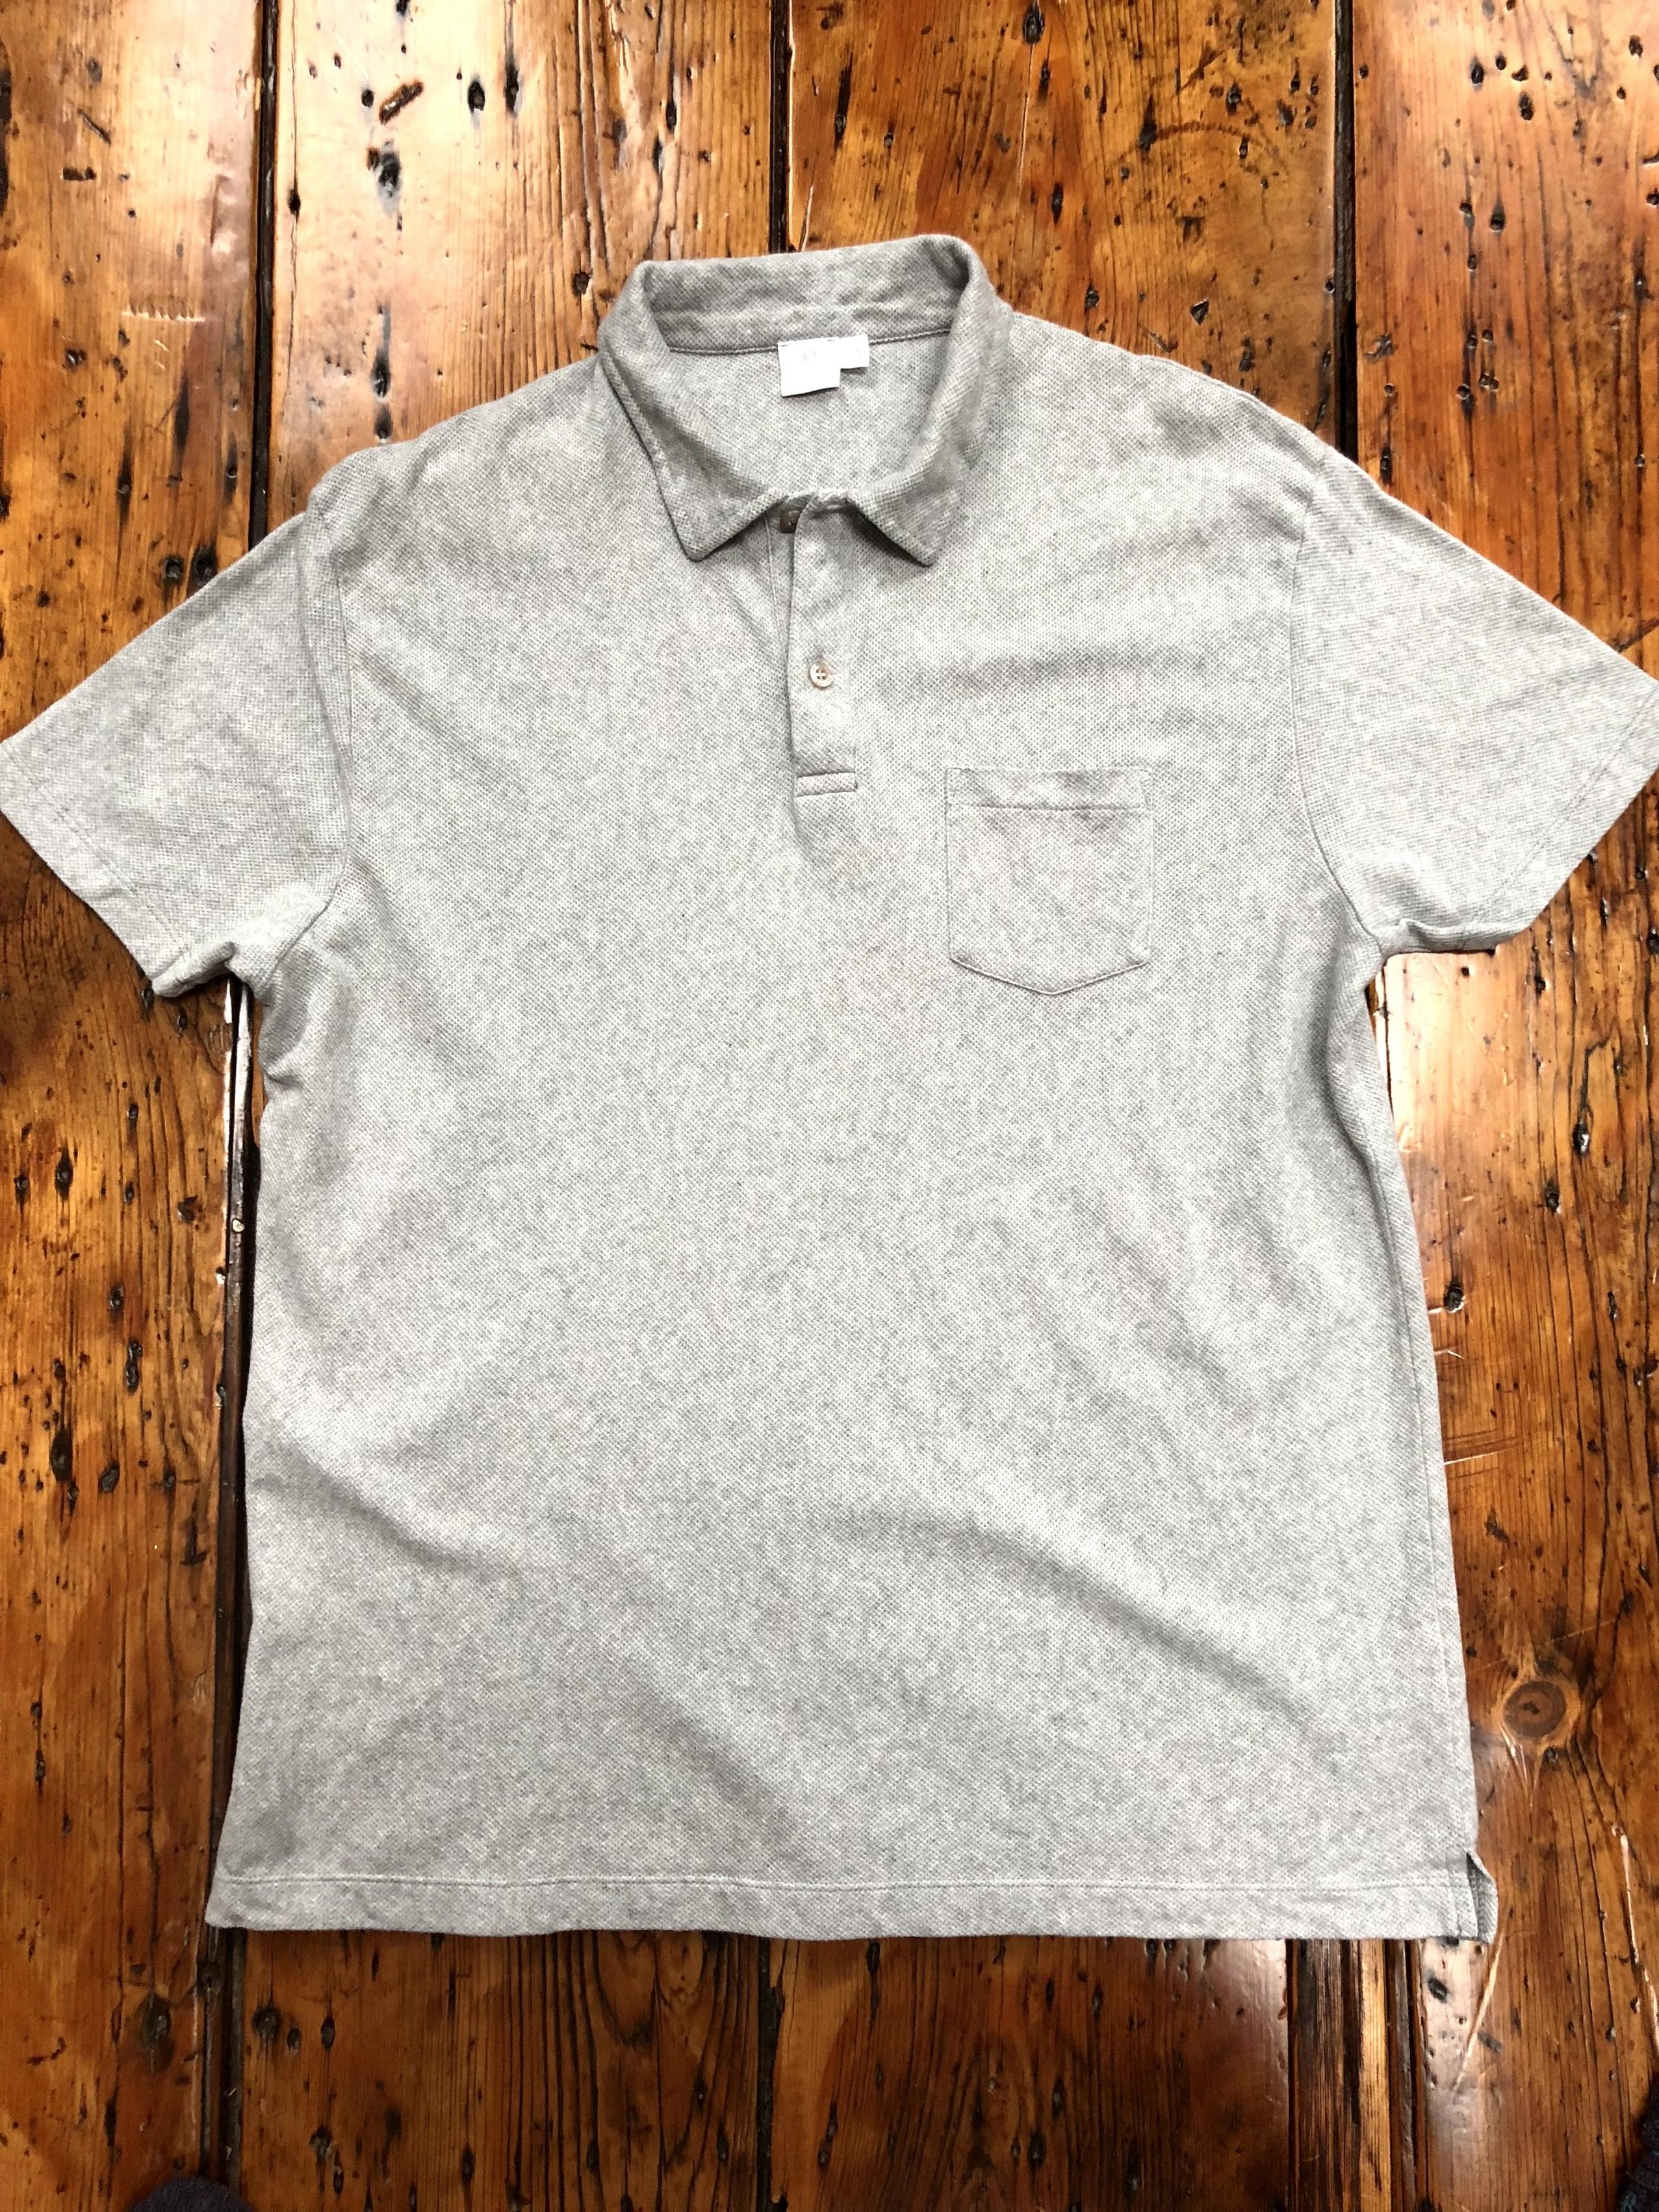 ed3c0d45 Sunspel Men's Combed Cotton Riviera Polo Shirt In Grey Melange   Grailed